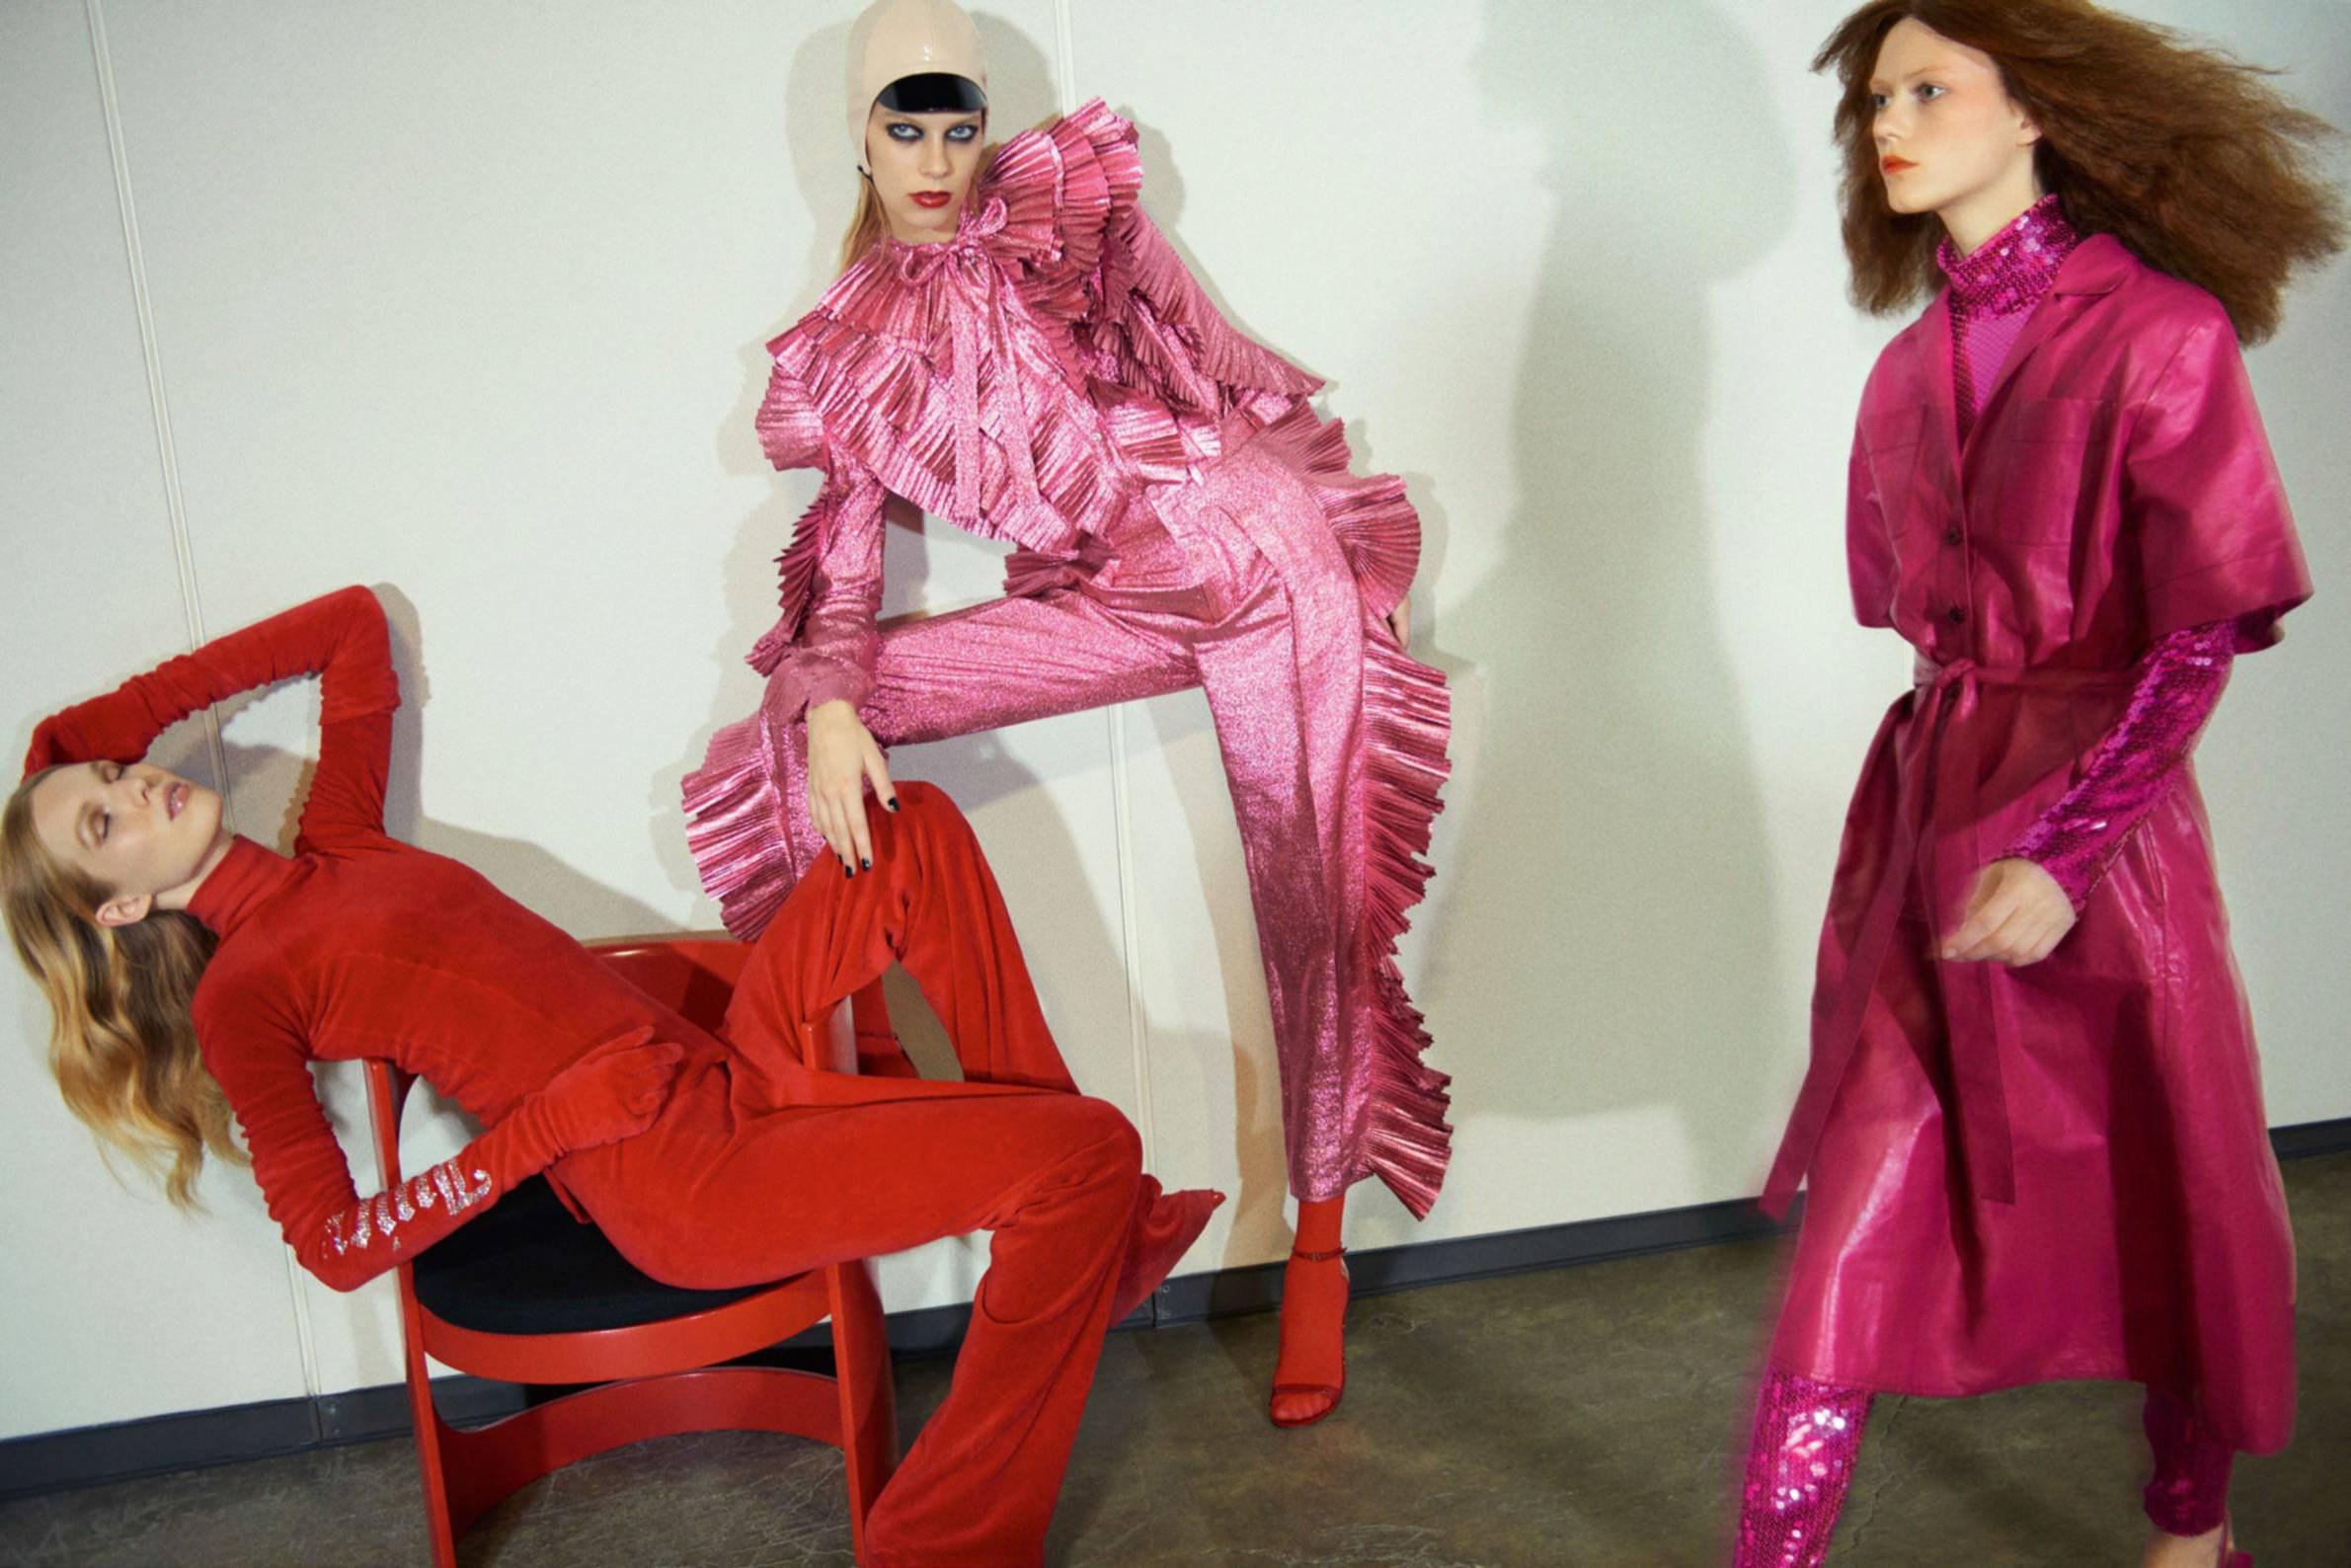 ... Vogue Paris February 2017 By Glen Luchford 02  ...